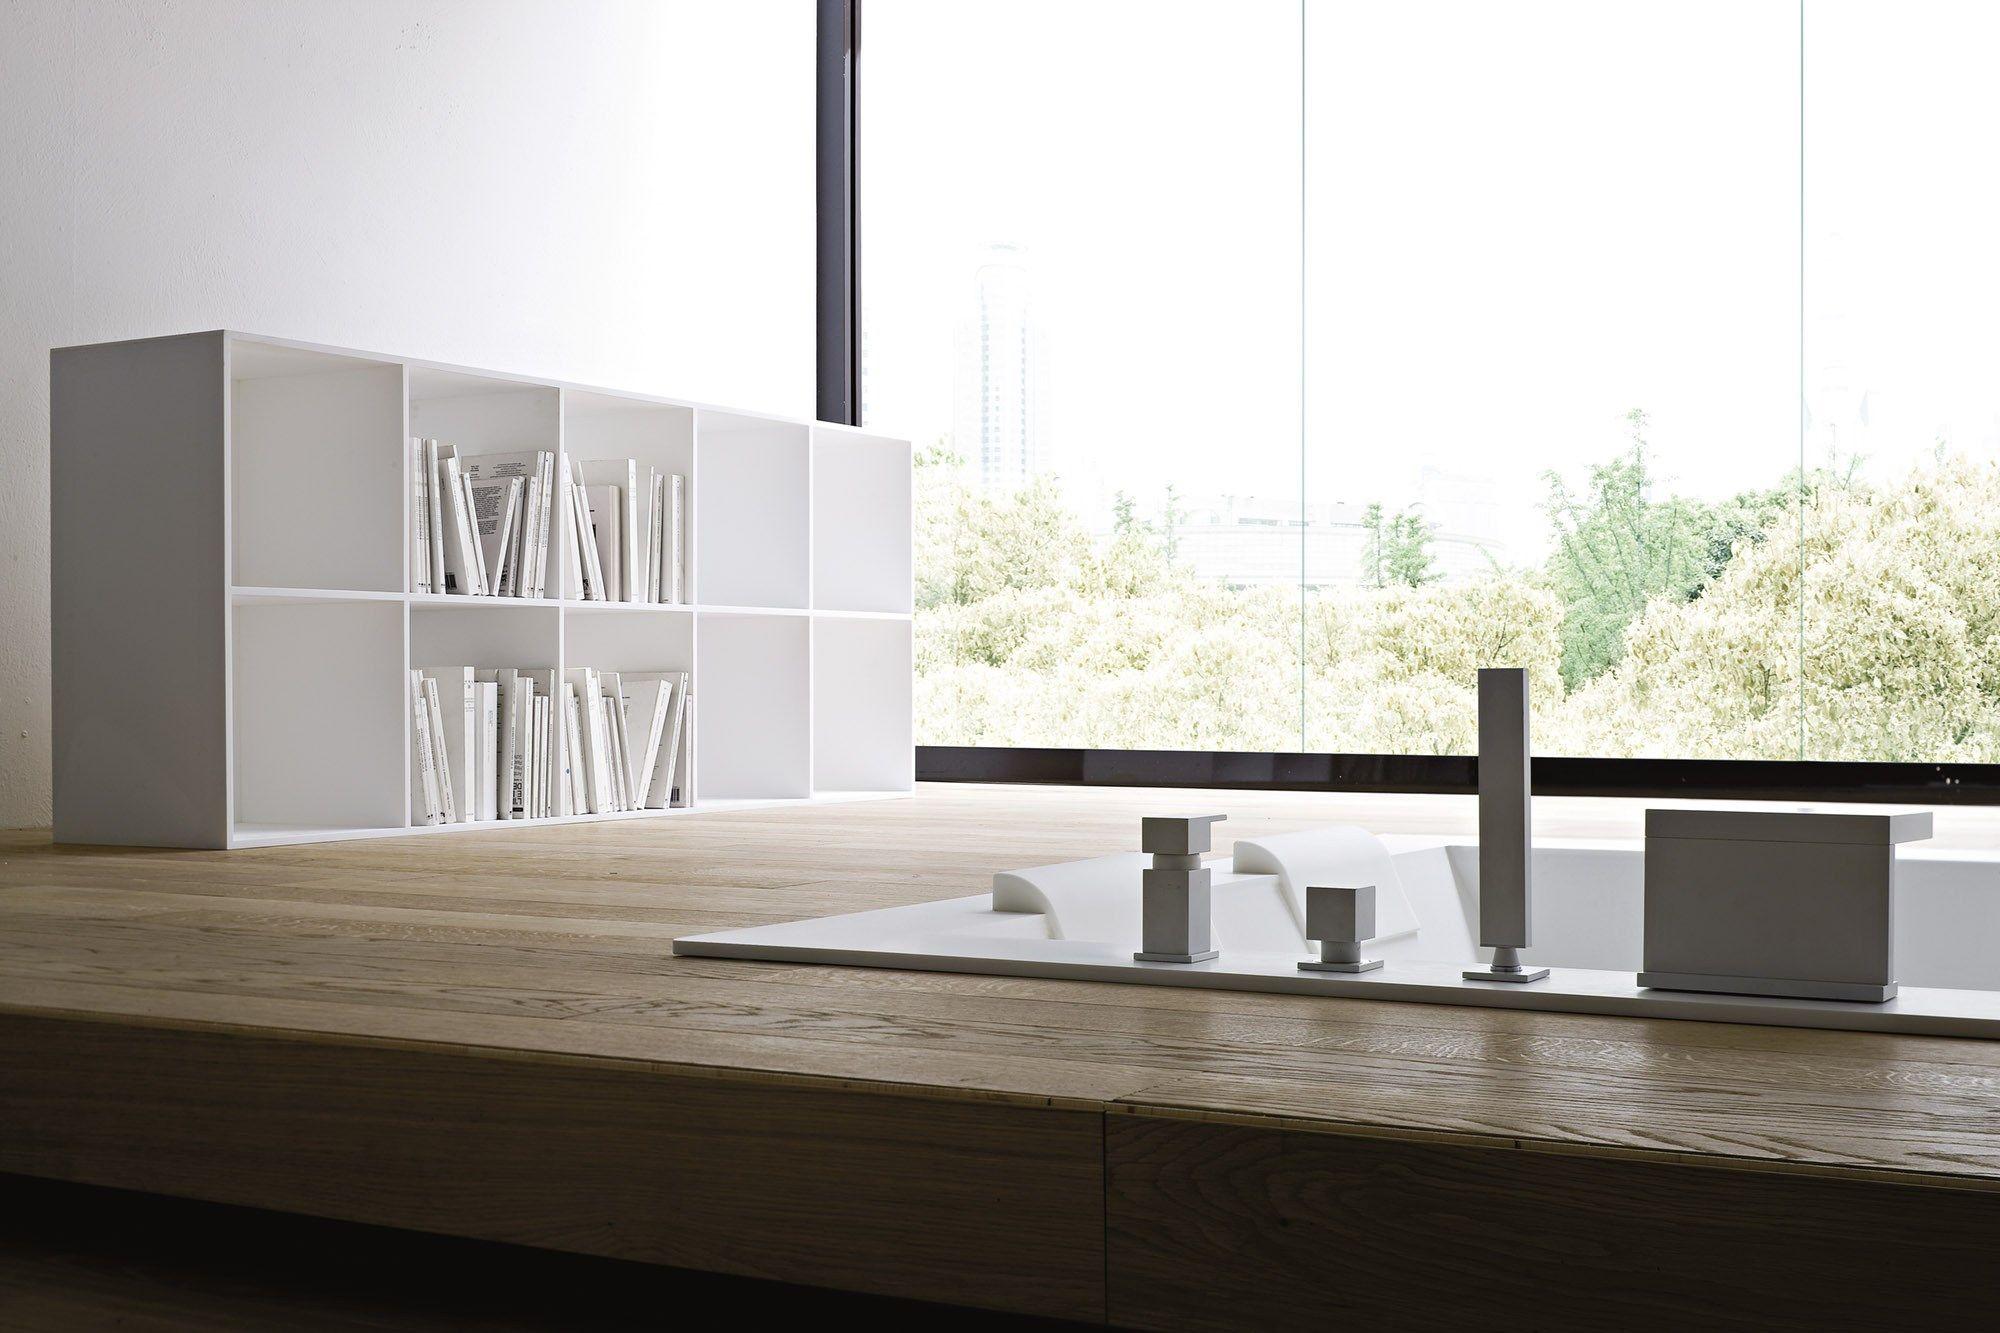 Vasca Da Bagno Unico : Unico vasca da bagno da incasso by rexa design design imago design